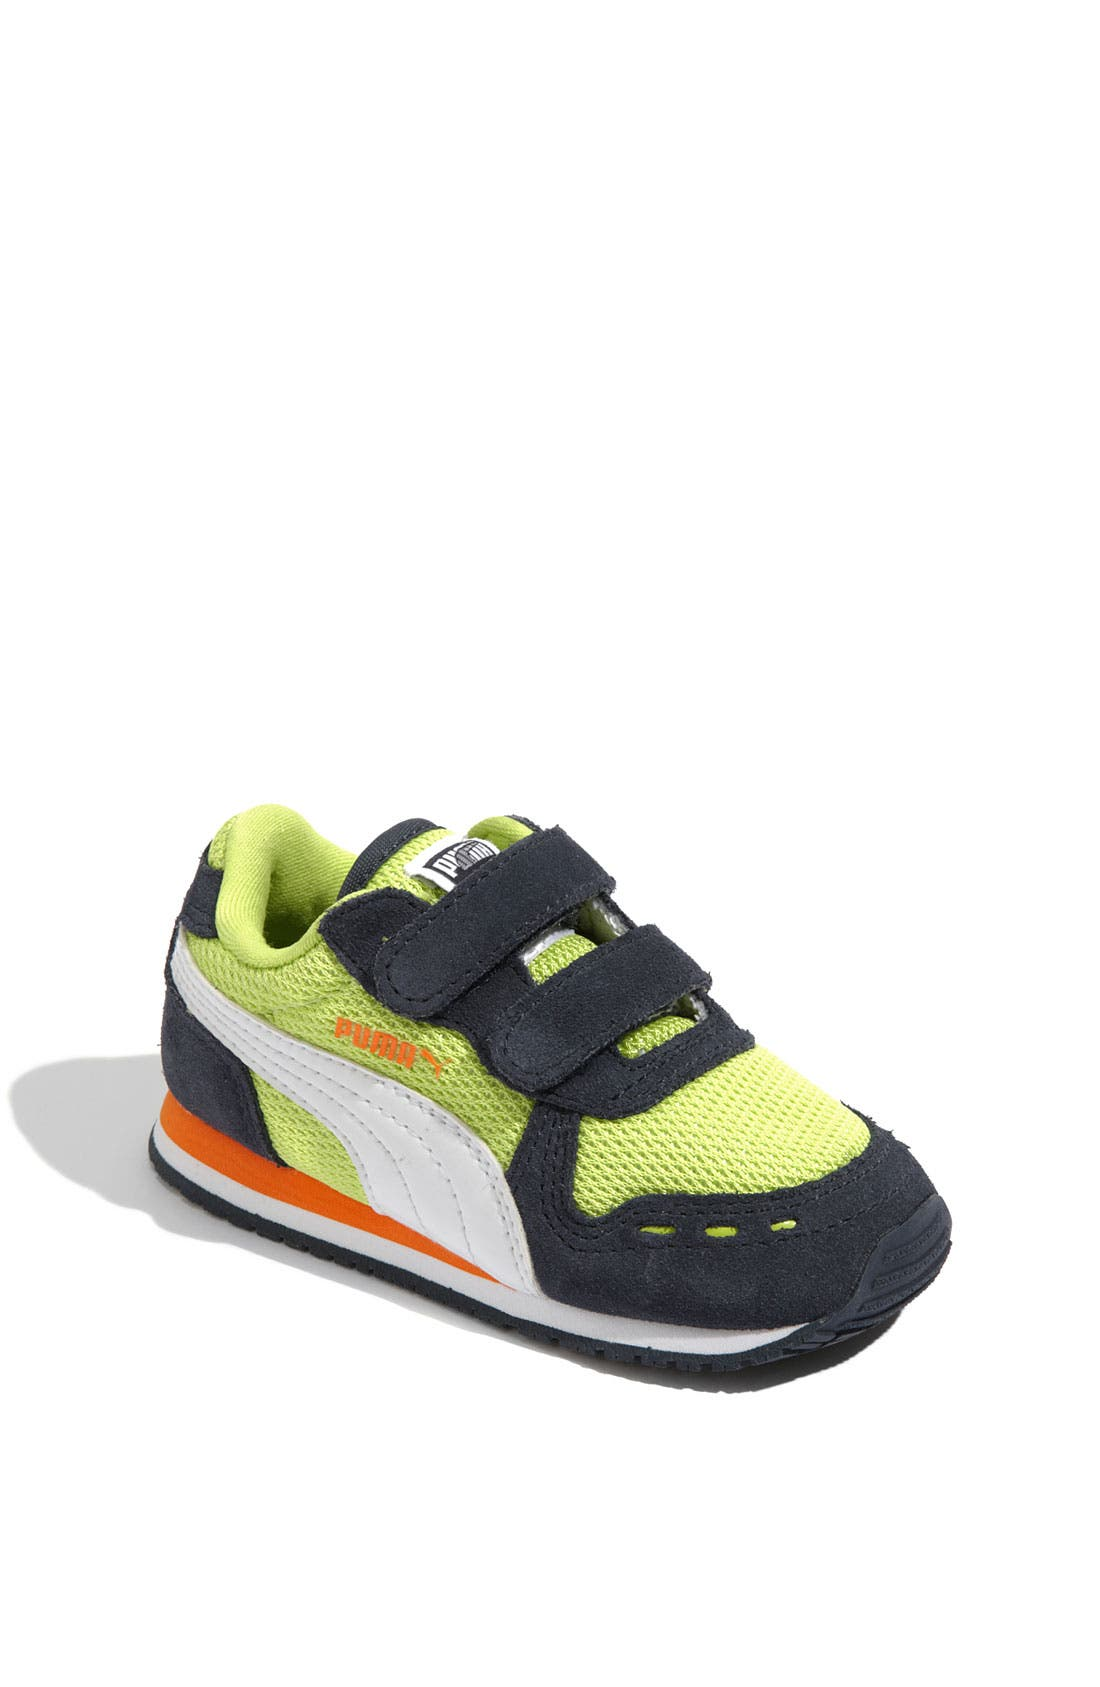 Alternate Image 1 Selected - PUMA 'Cabana Racer' Sneaker (Baby, Walker, Toddler & Little Kid)